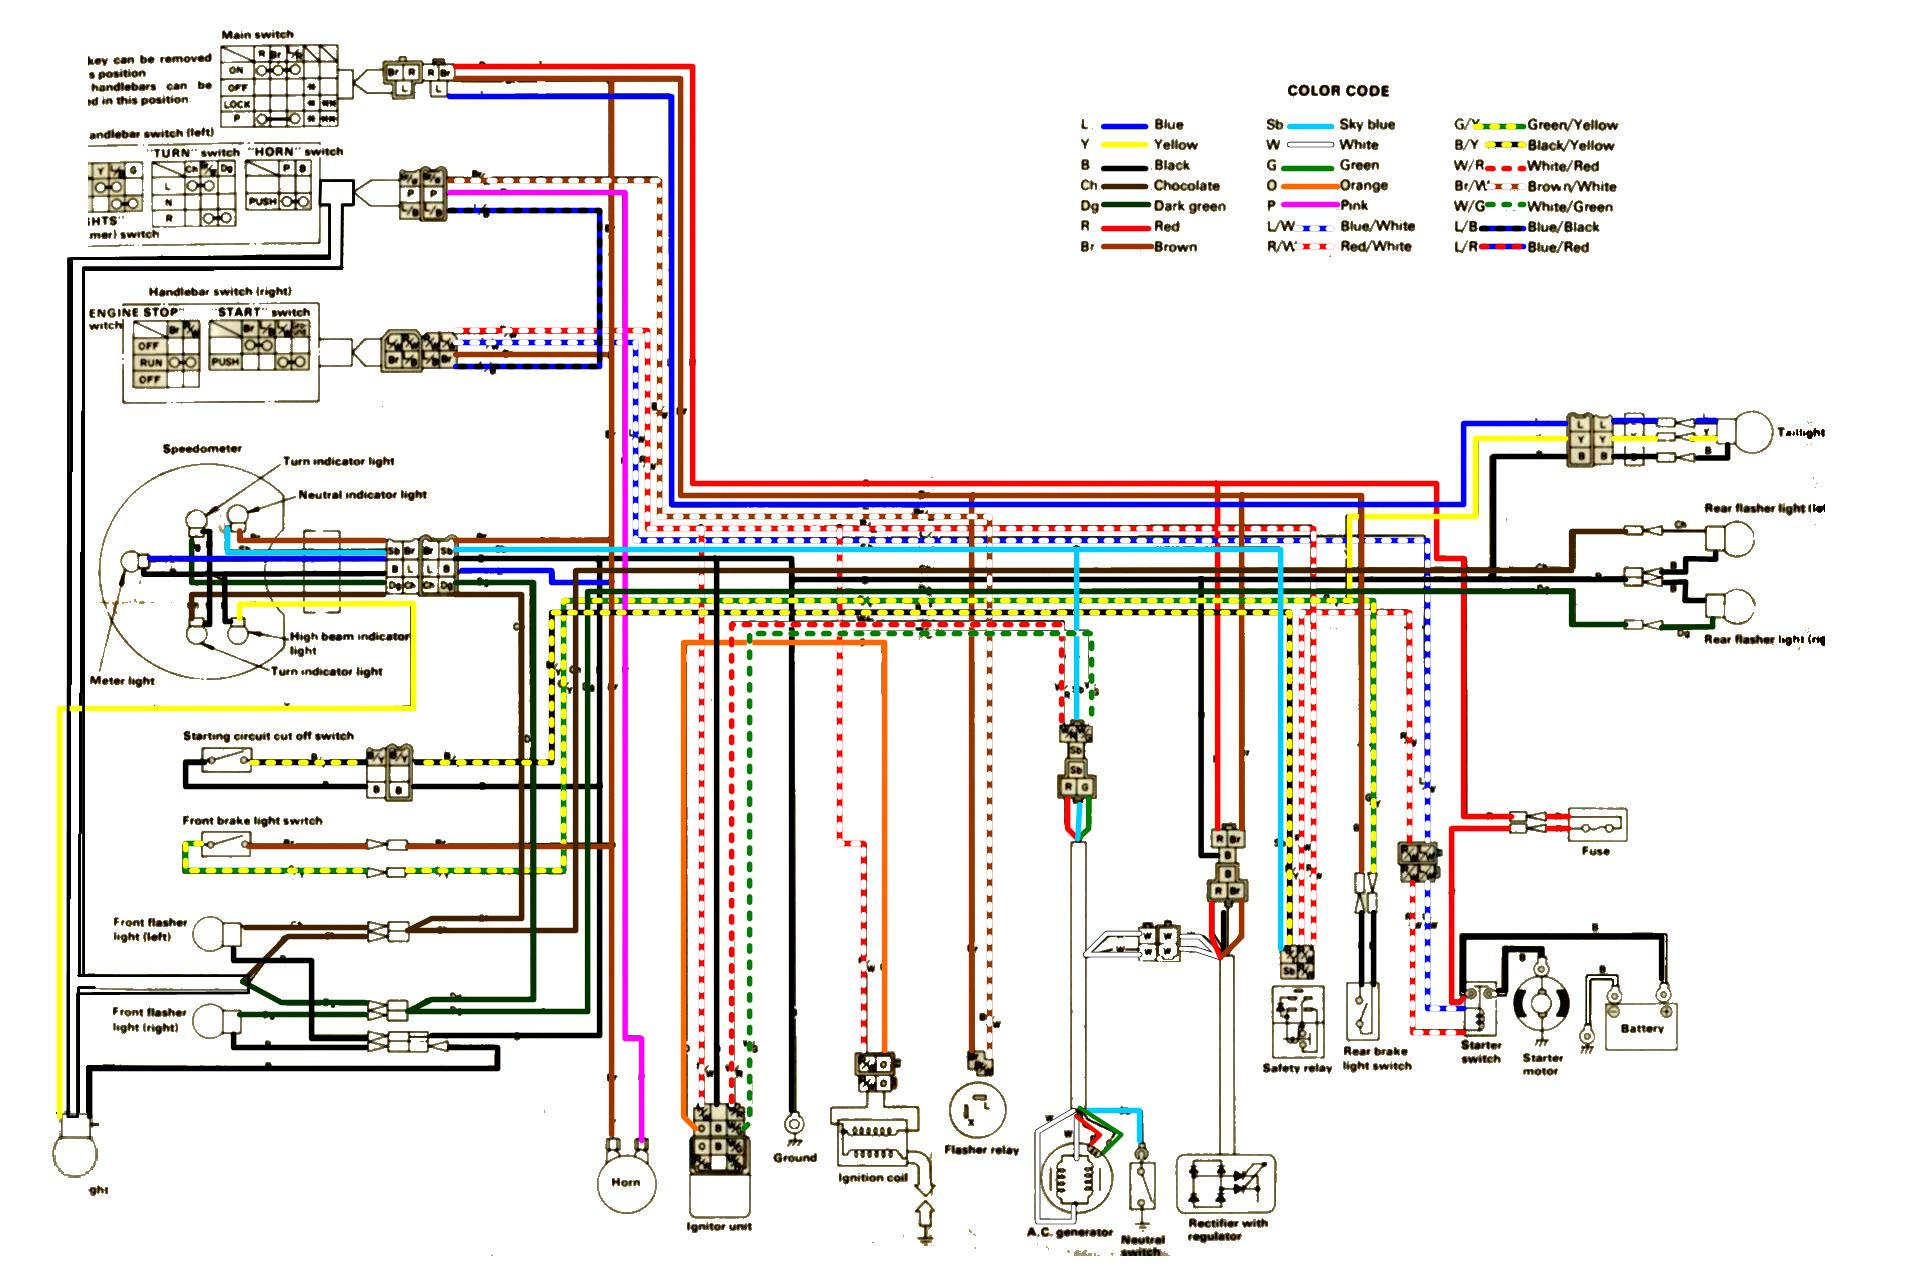 hight resolution of bobcat parts diagram bobcat free engine image for user bobcat mower wiring diagram bobcat wiring schematic